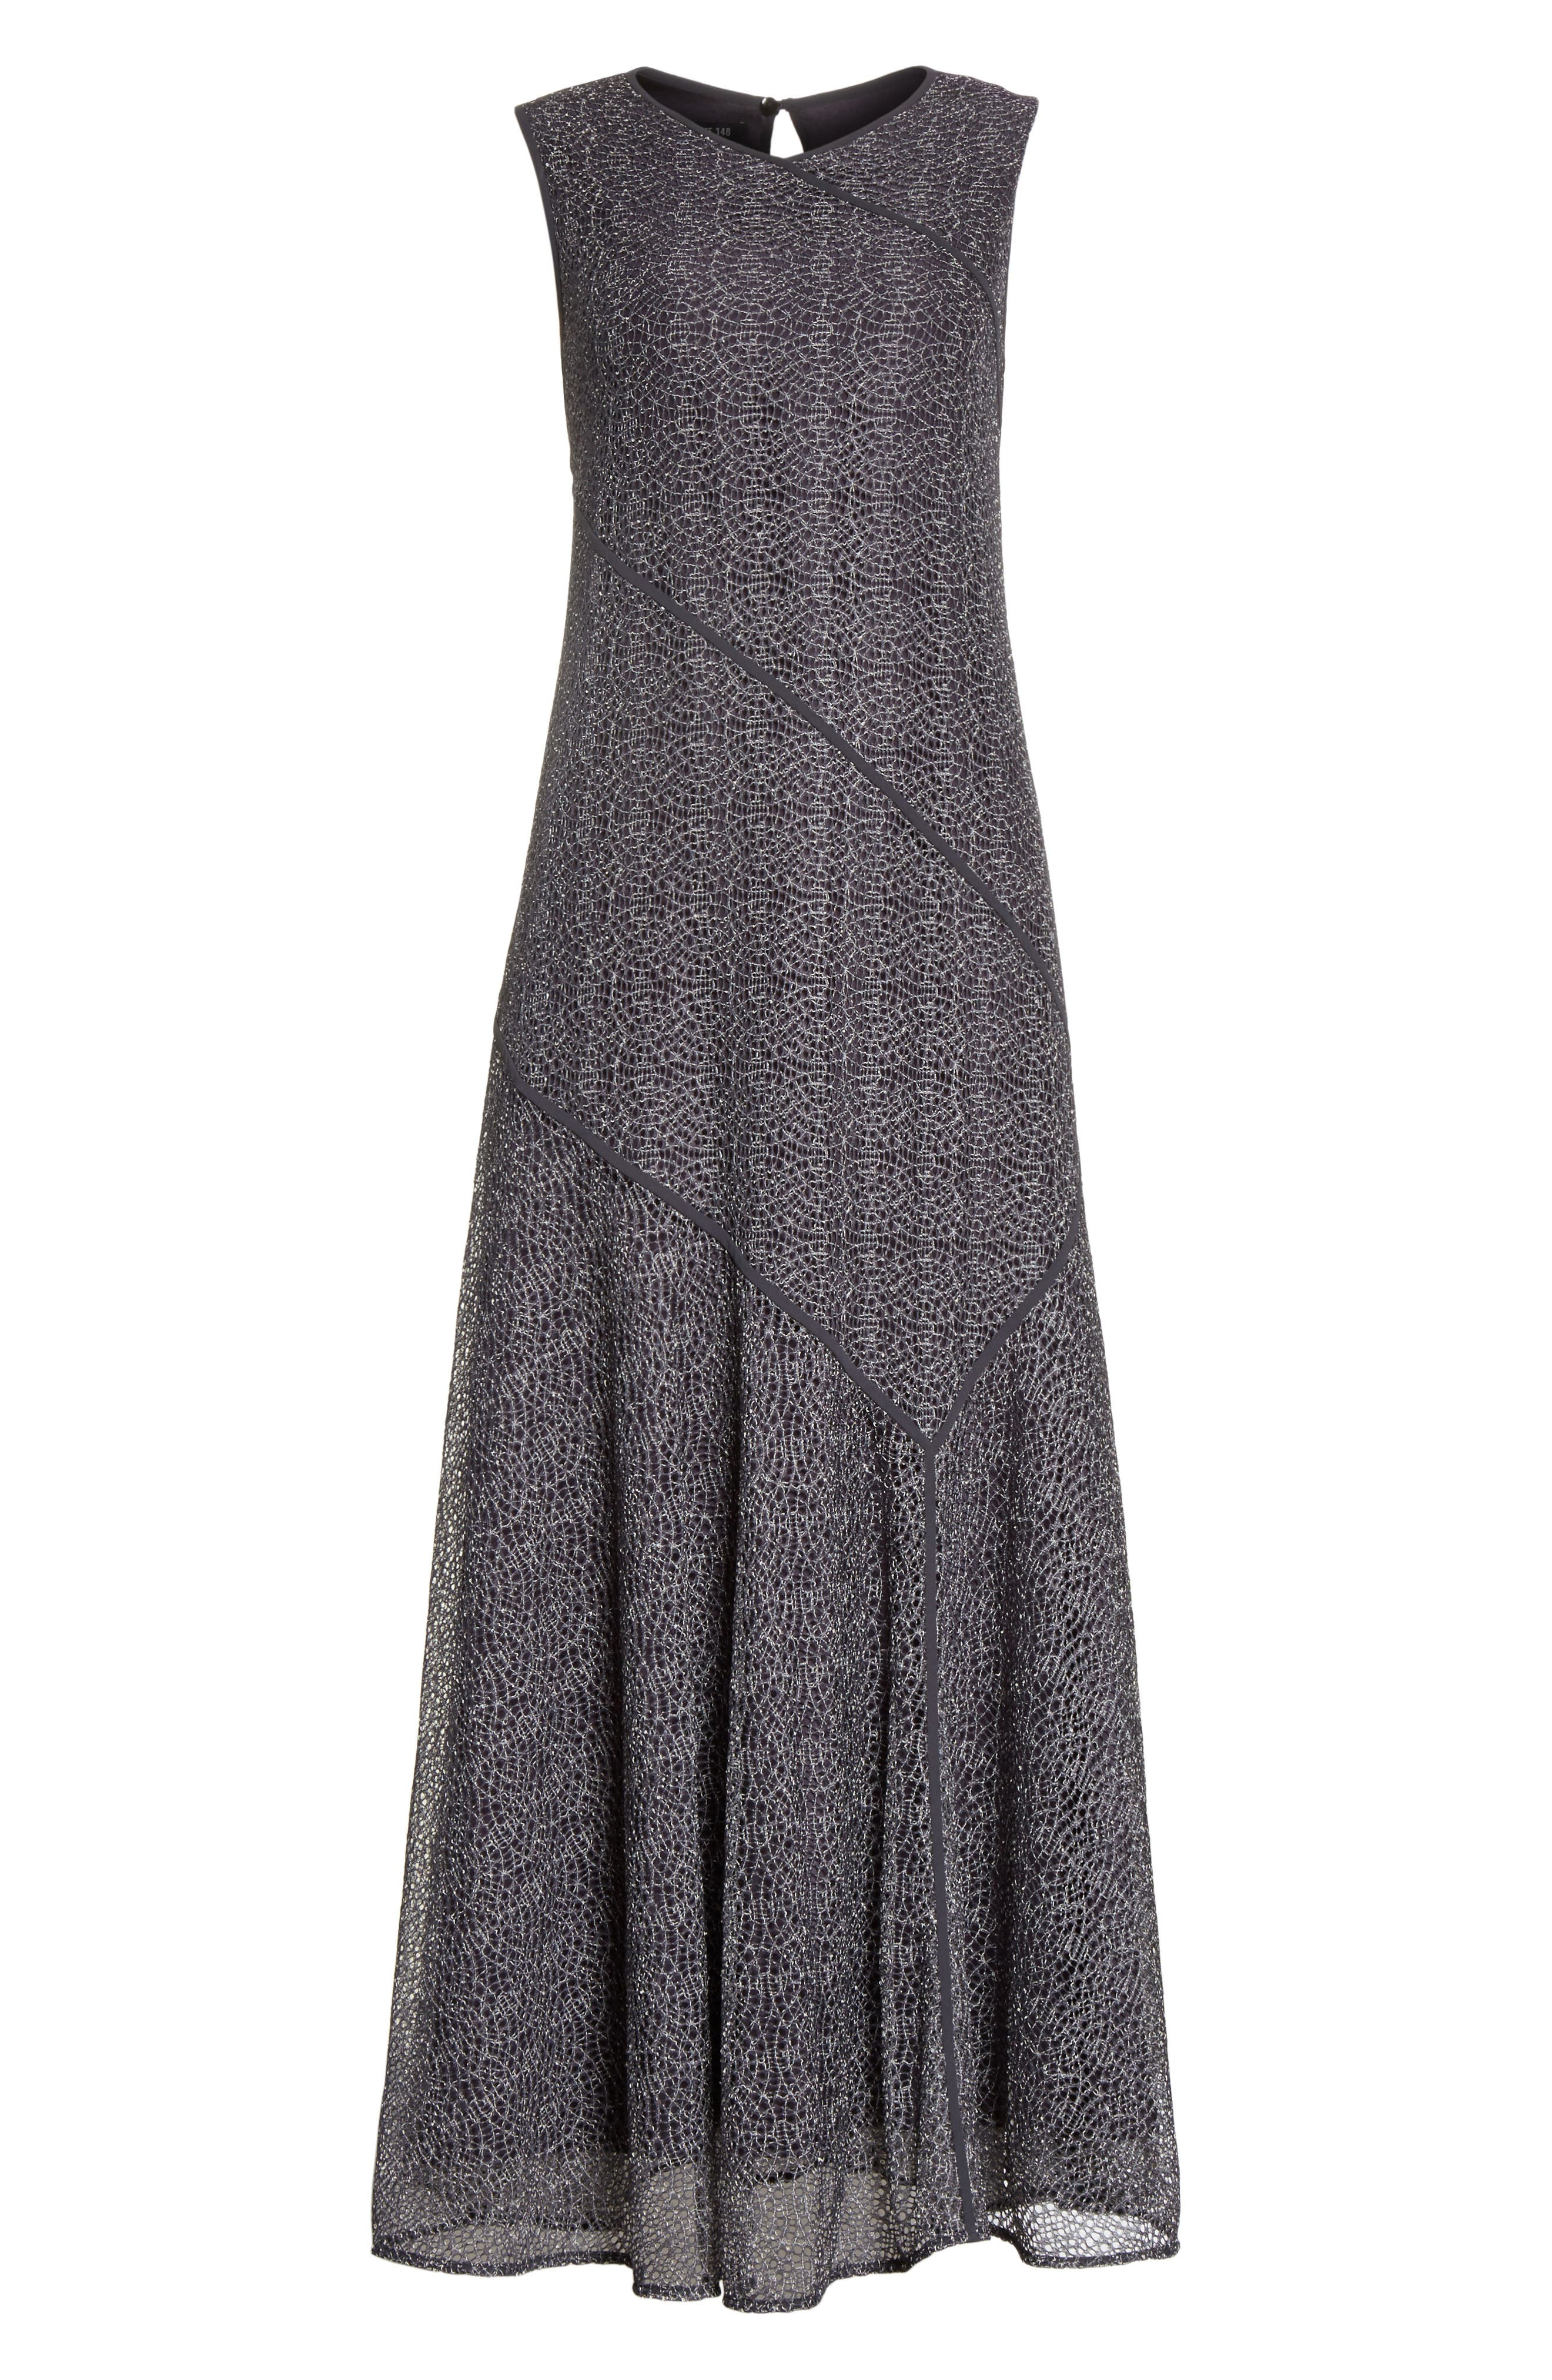 Rubina Dress,                             Alternate thumbnail 7, color,                             Admiral Blue Multi